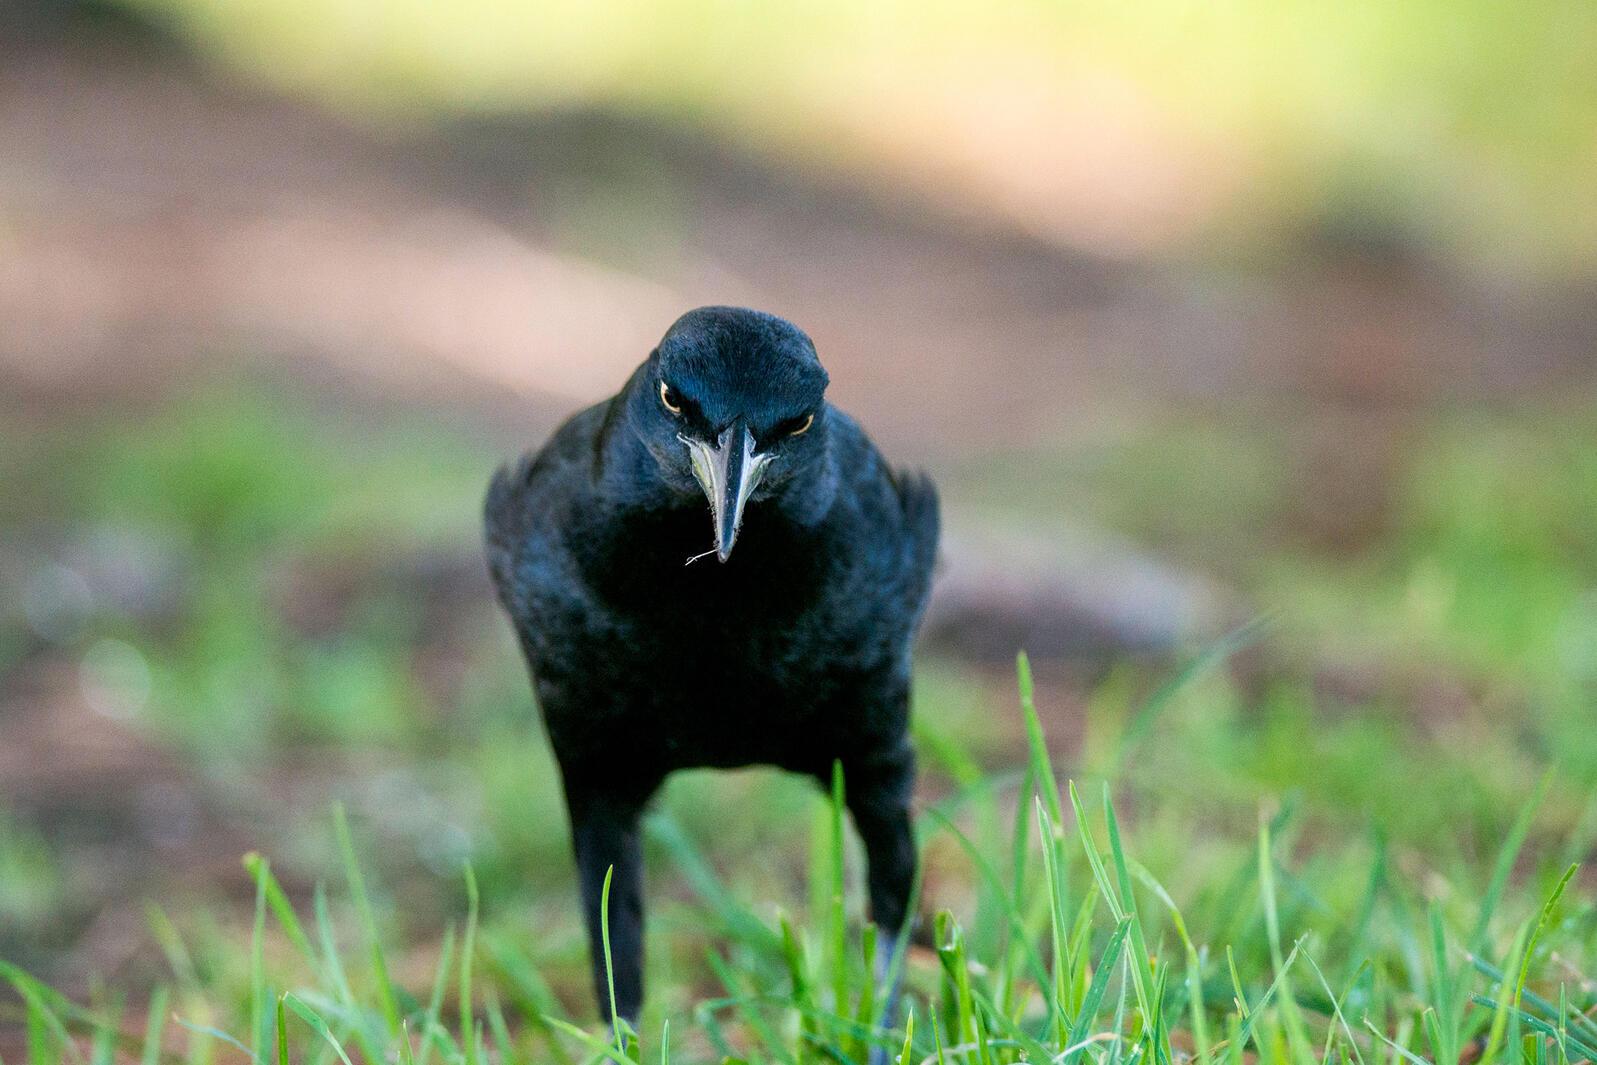 Great-tailed Grackle. Sandrine Biziaux Scherson/Audubon Photography Awards